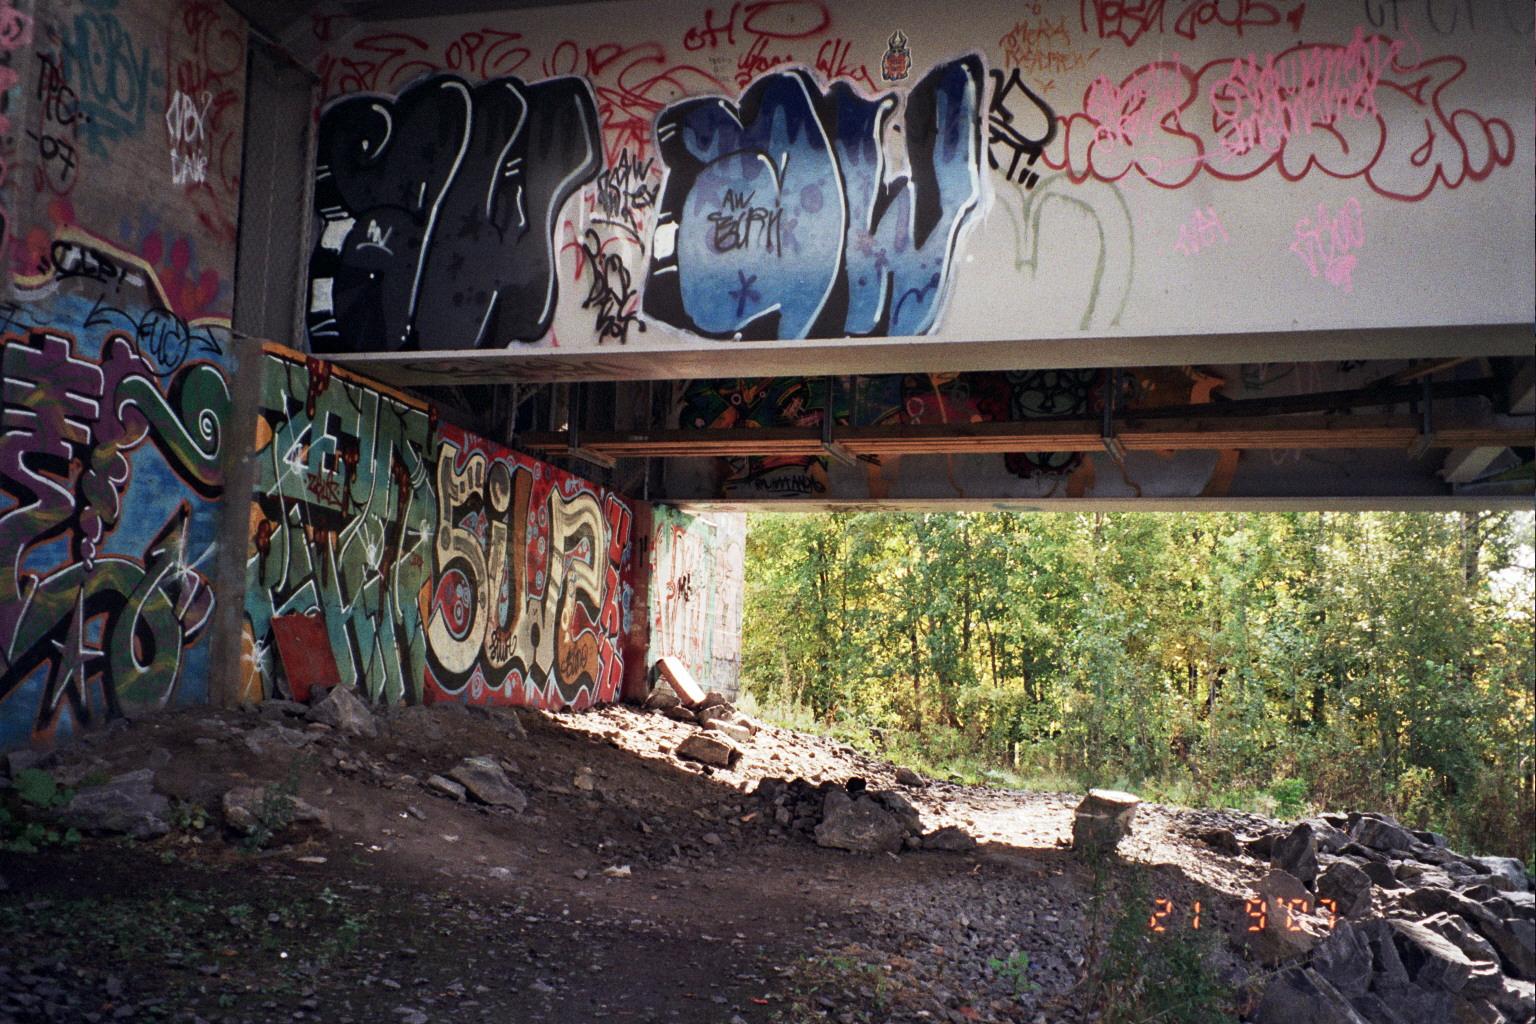 external image Graffiti_under_bridge_in_Tampere_2007.jpg